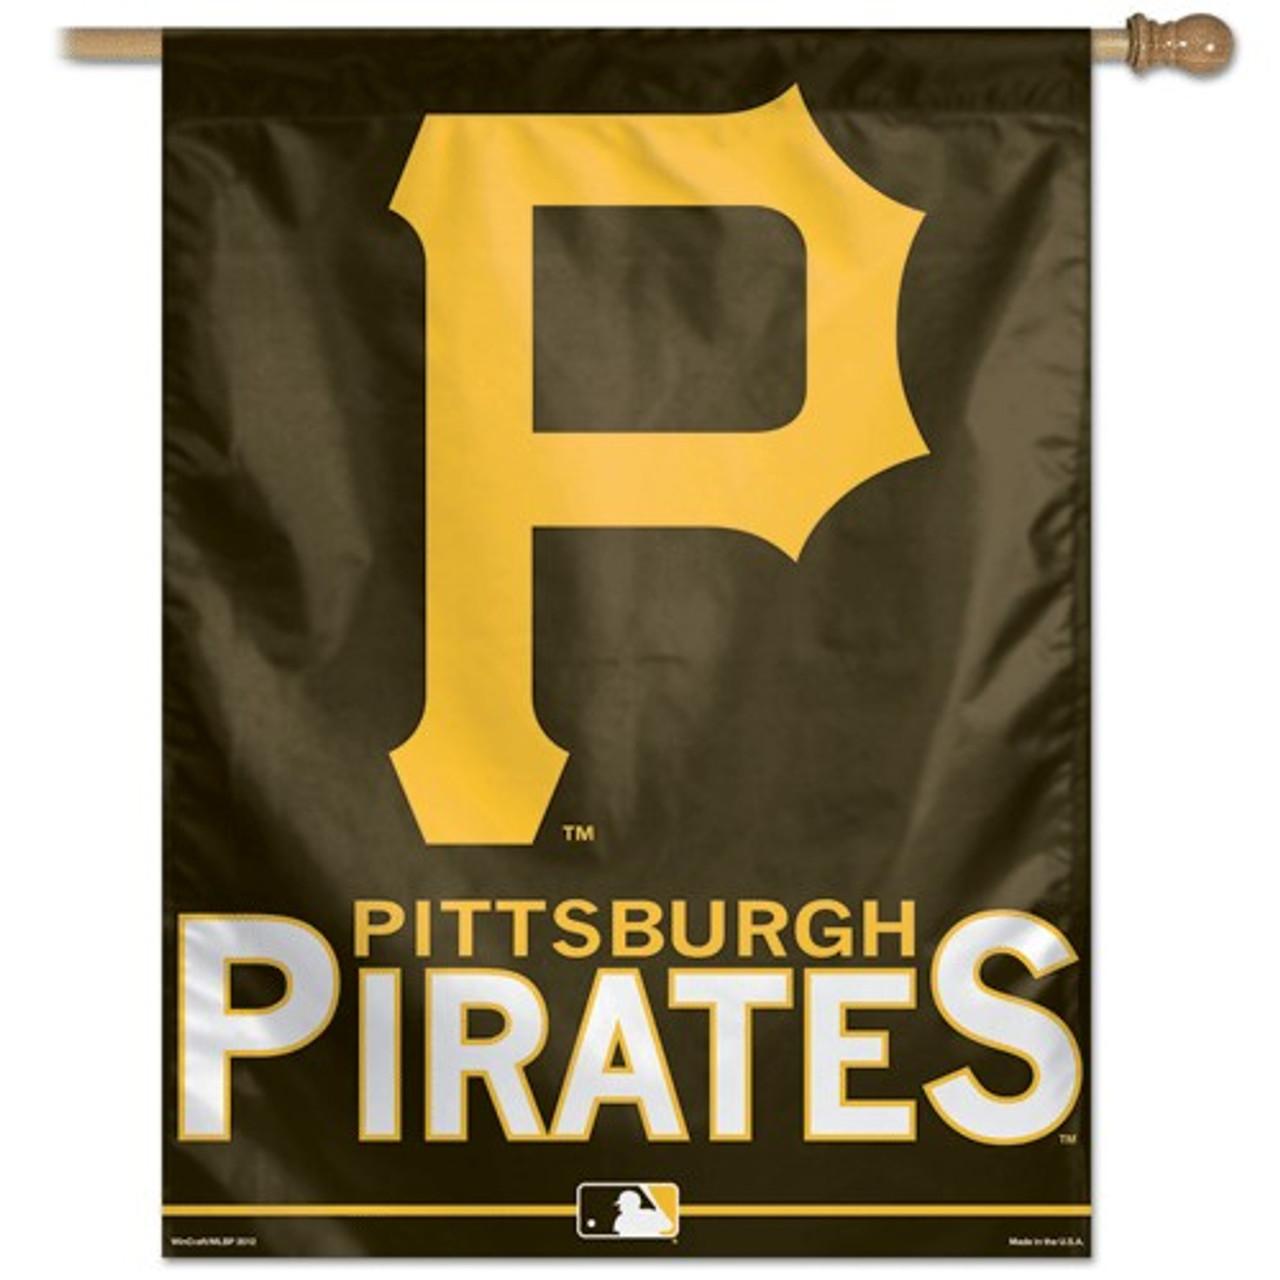 Pittsburgh Pirates Banner 27x37 Vertical